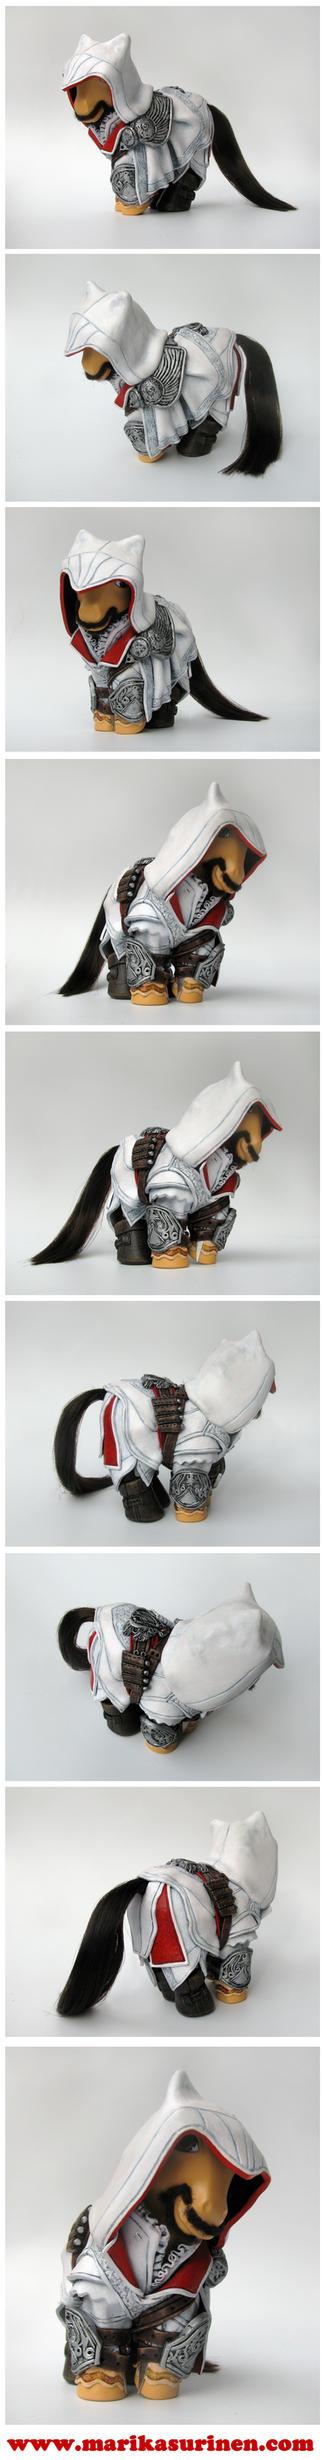 My Little Ezio Auditore by Spippo